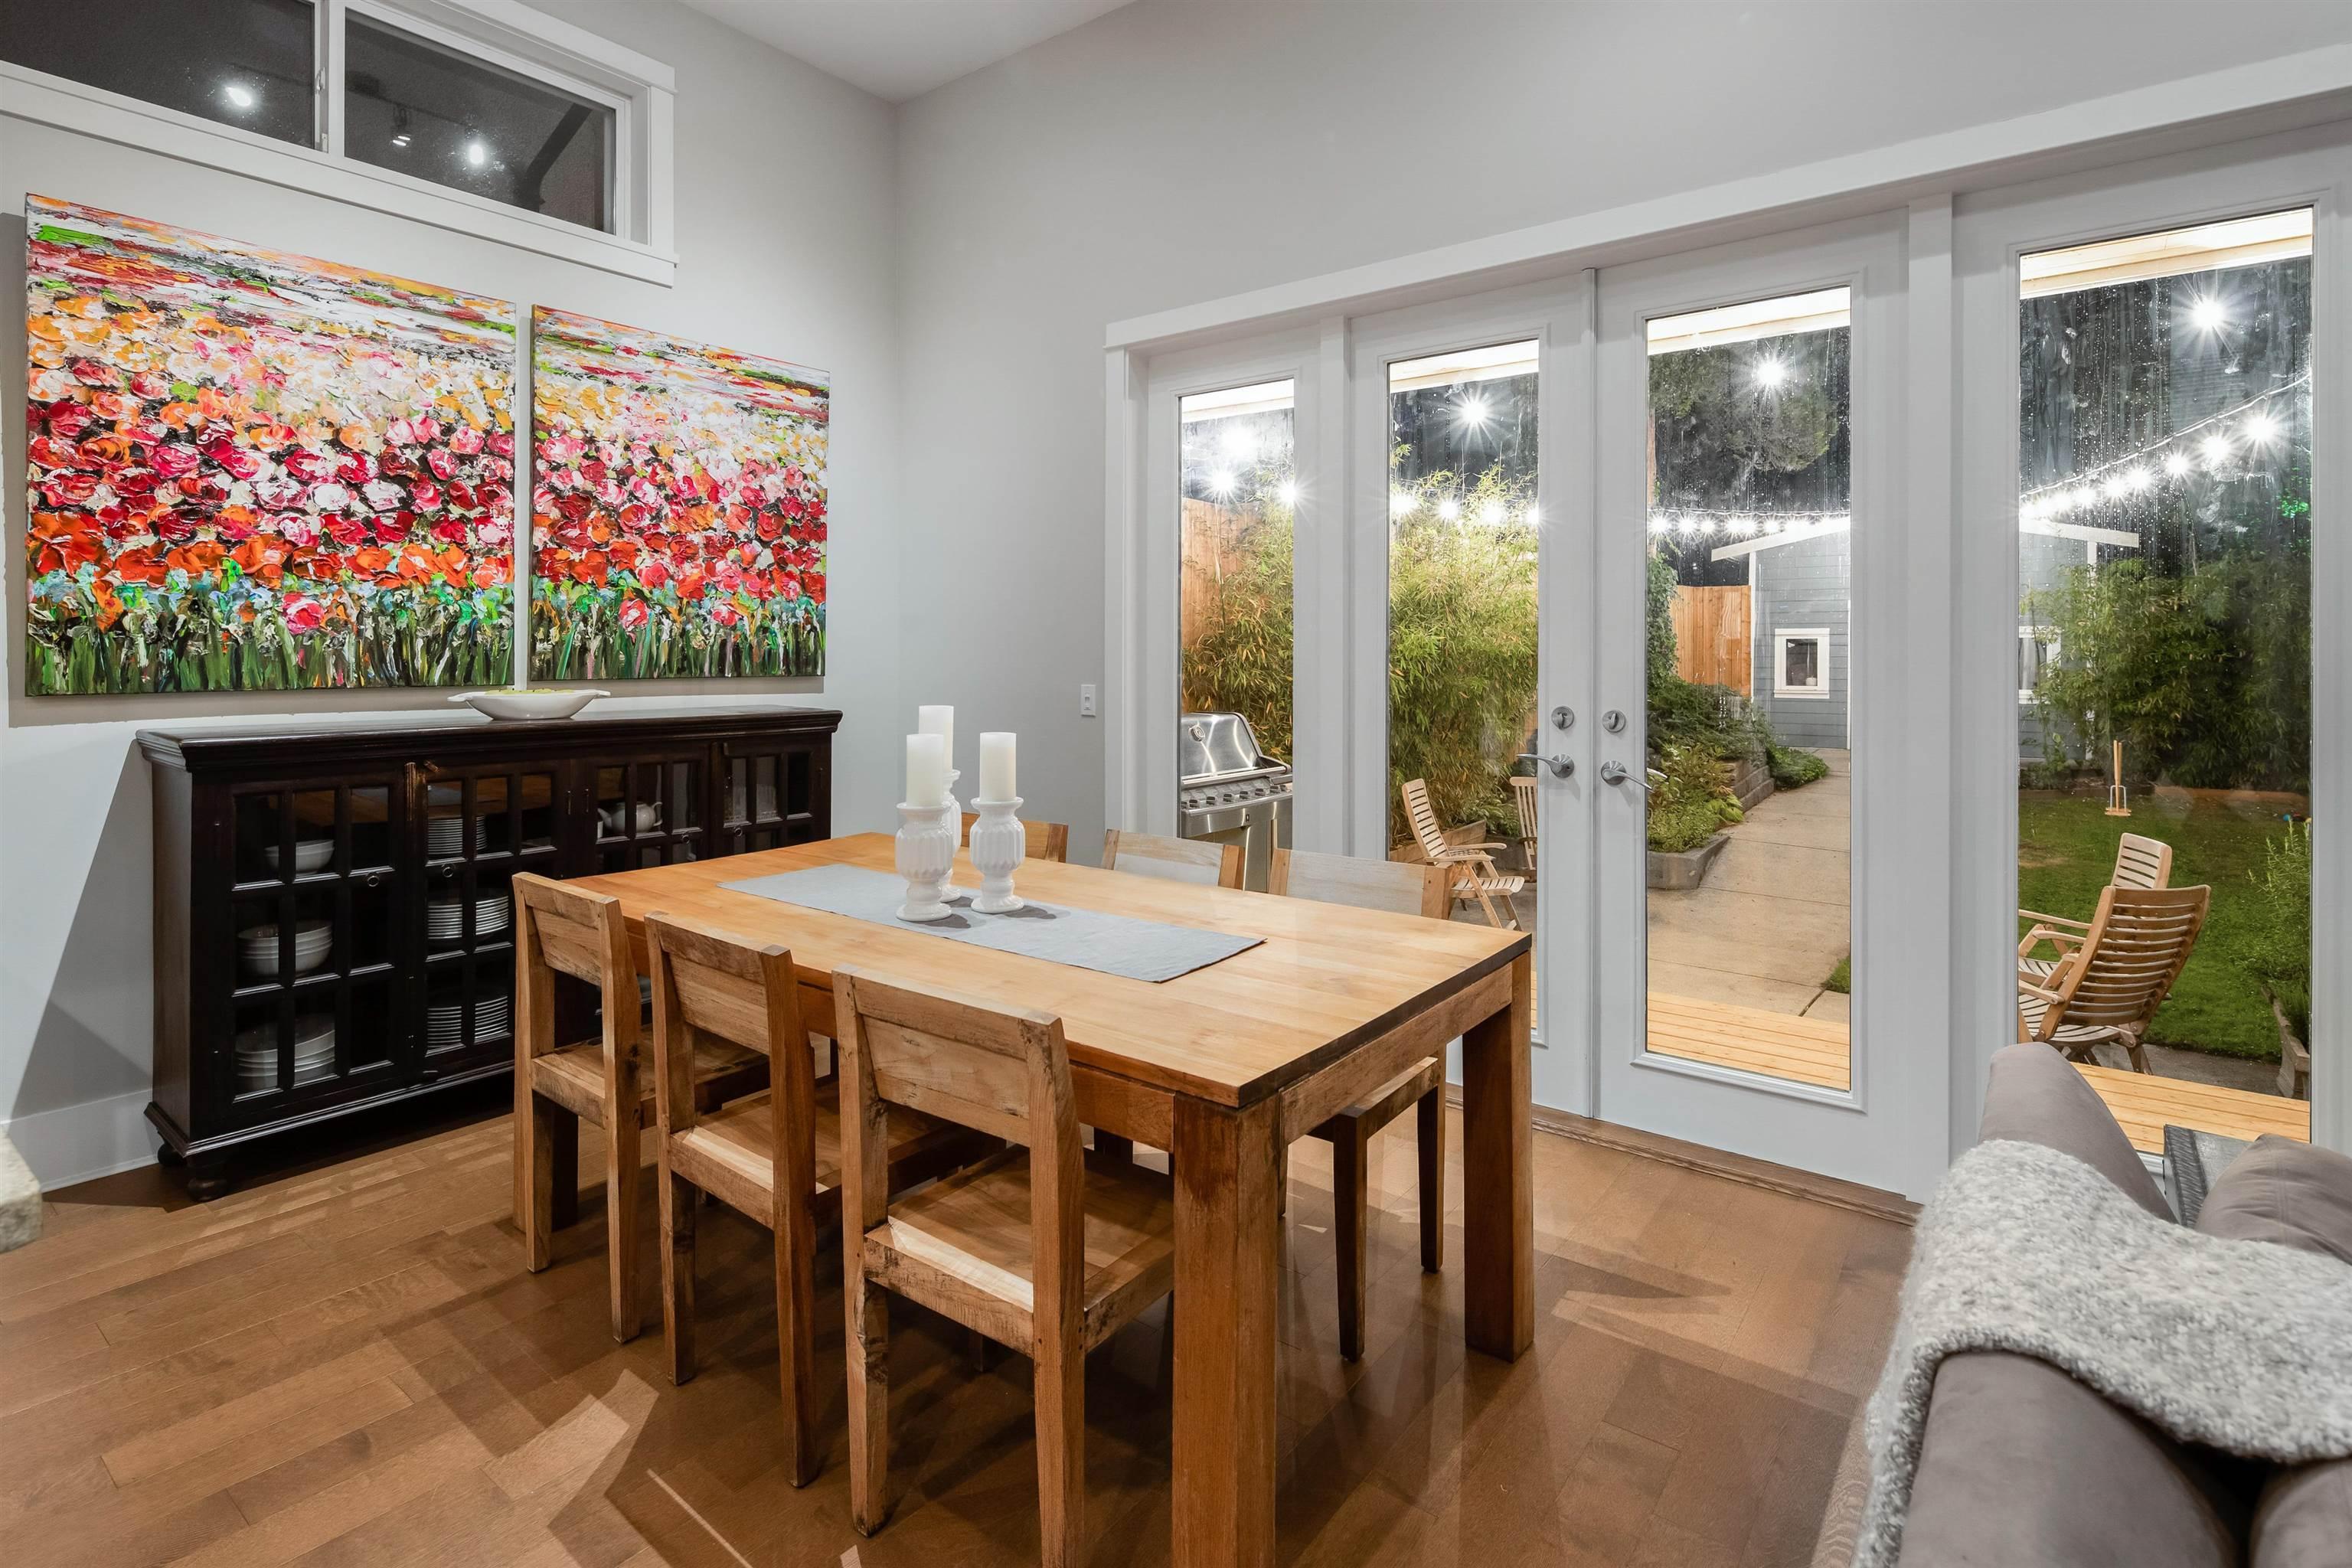 2258 WINDRIDGE DRIVE - Seymour NV House/Single Family for sale, 5 Bedrooms (R2617156) - #6